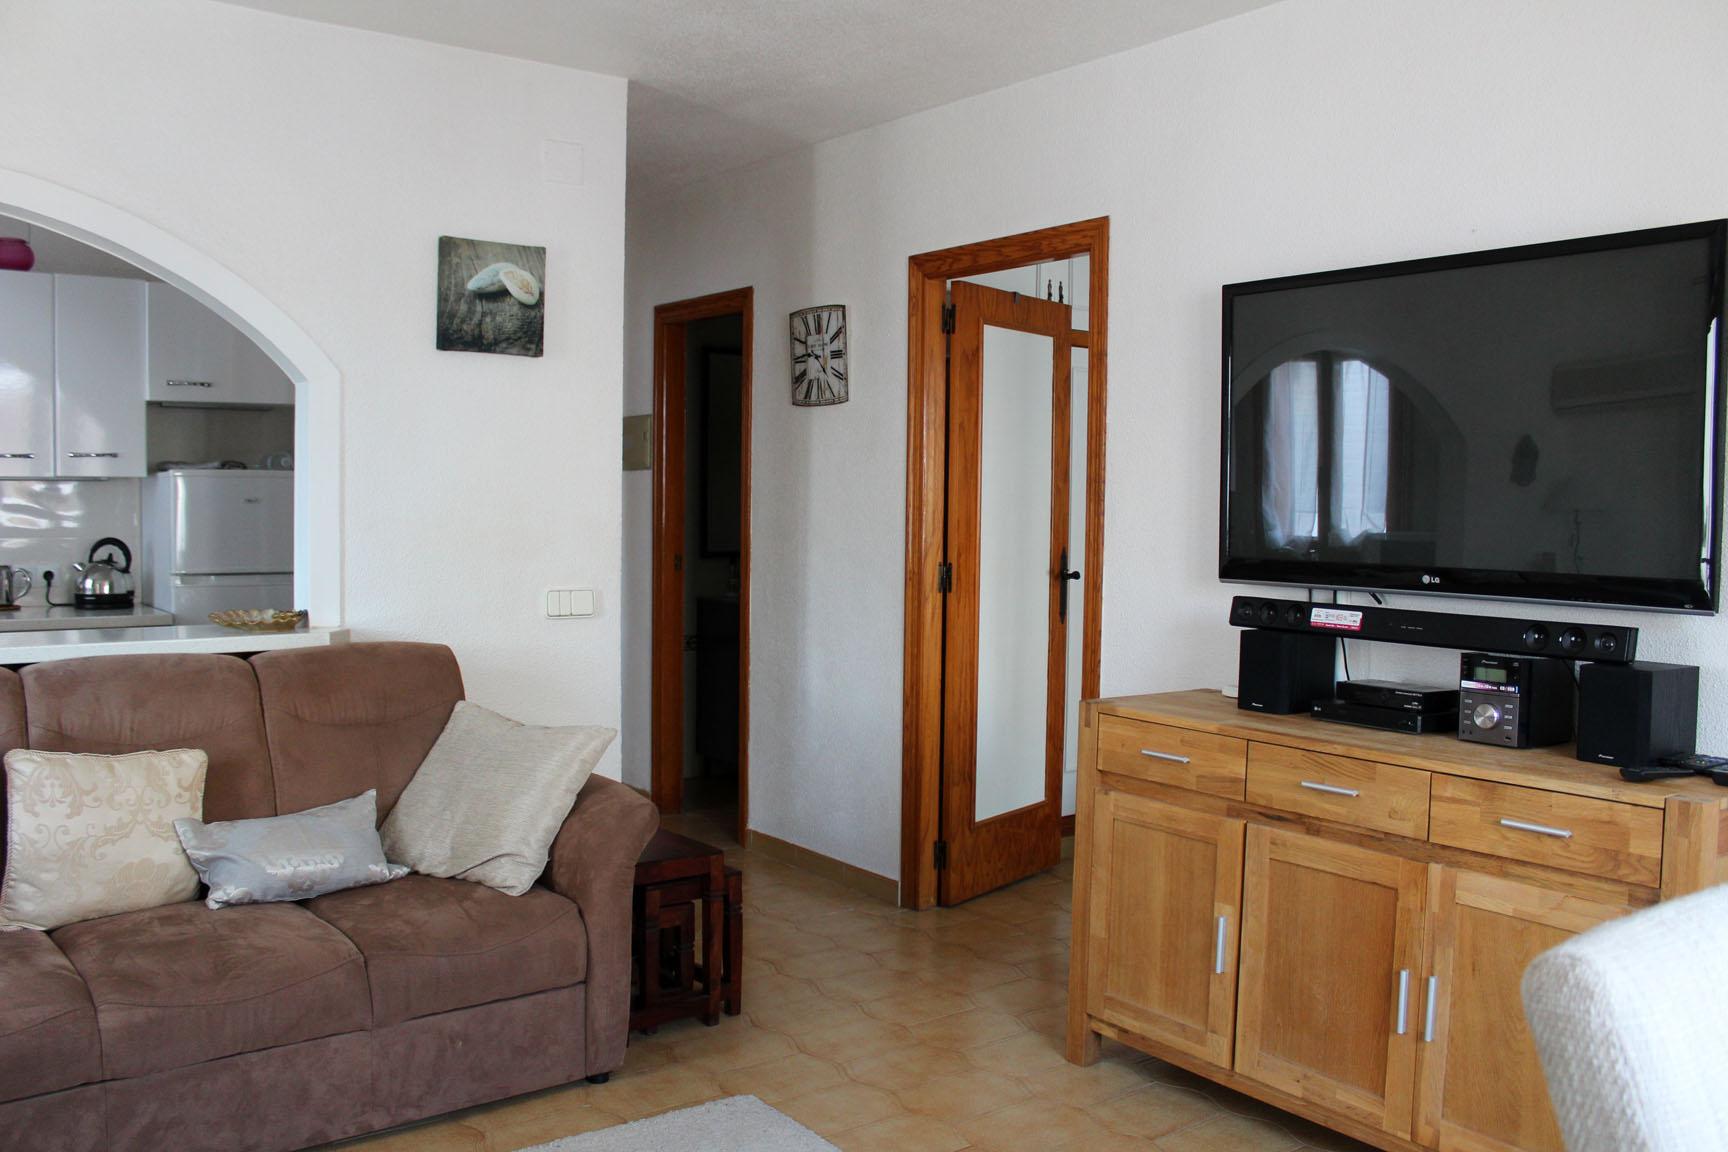 ITSH Property Full UK TV package and flat screen tele 5